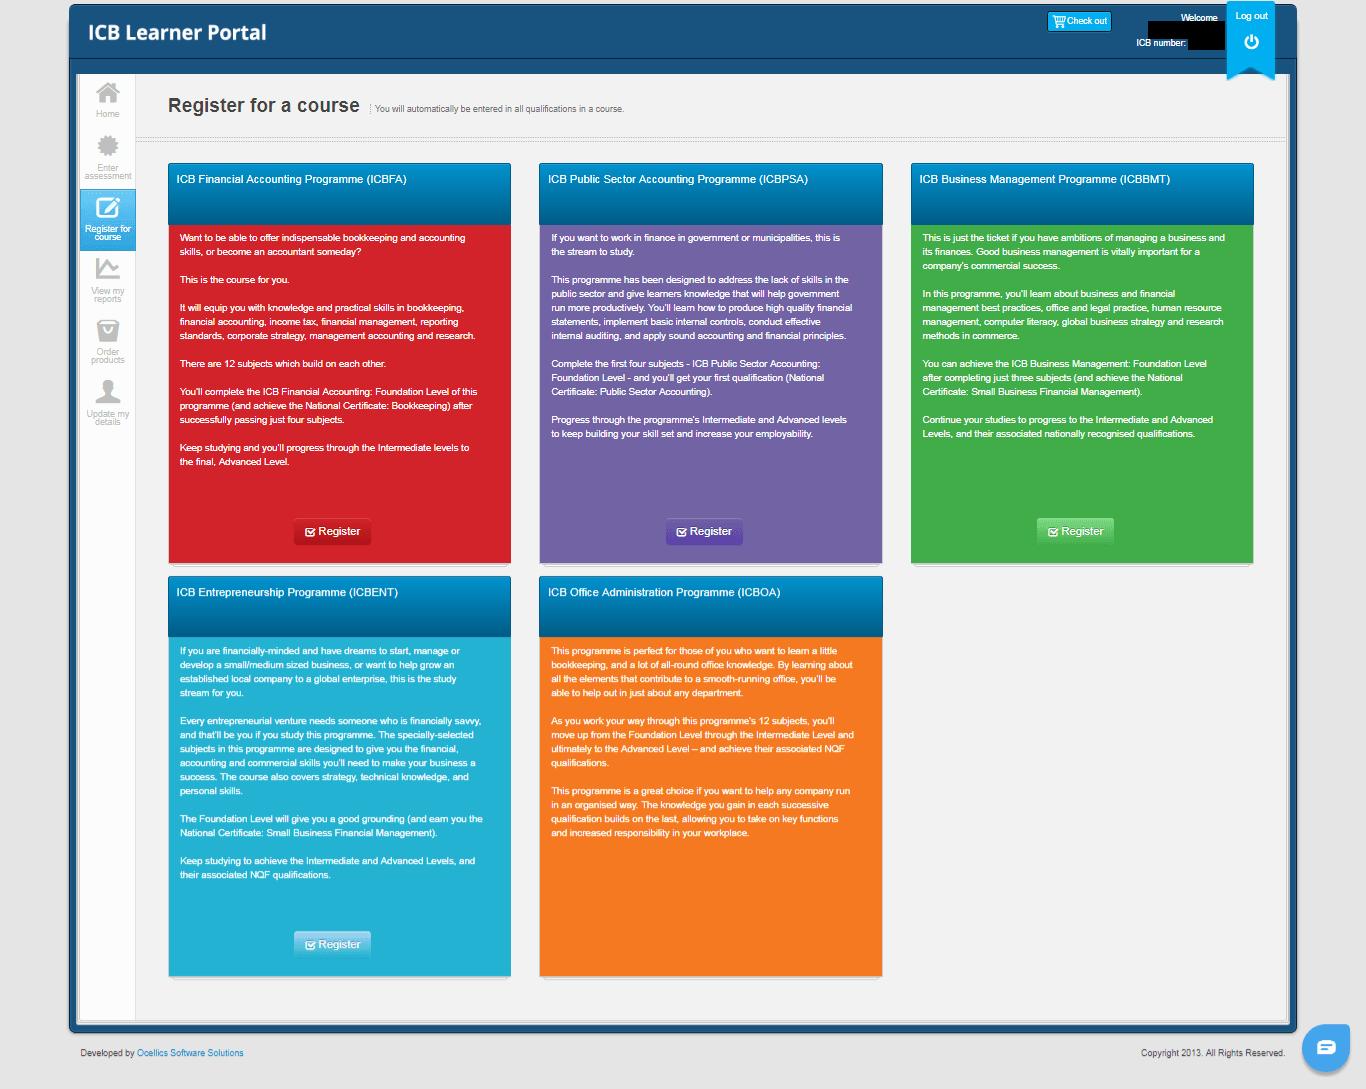 ICB Learner Portal 13